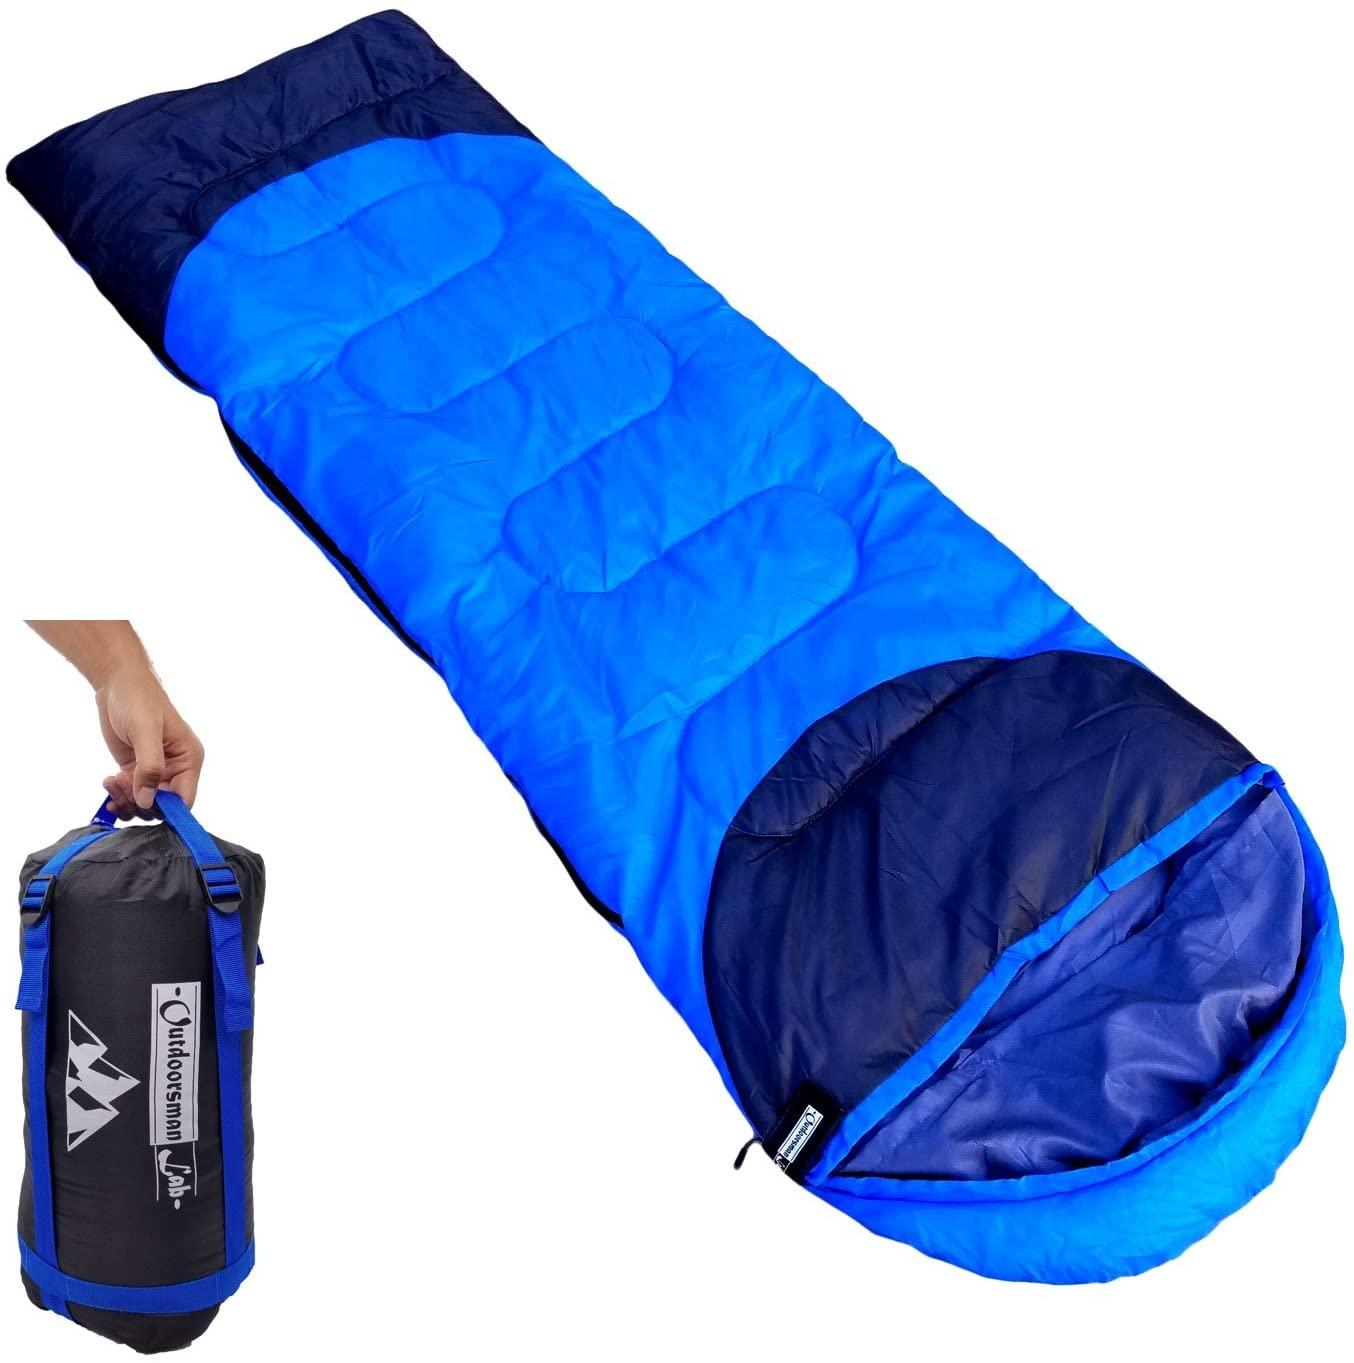 Outdoorsman Lab Lightweight Sleeping Bags